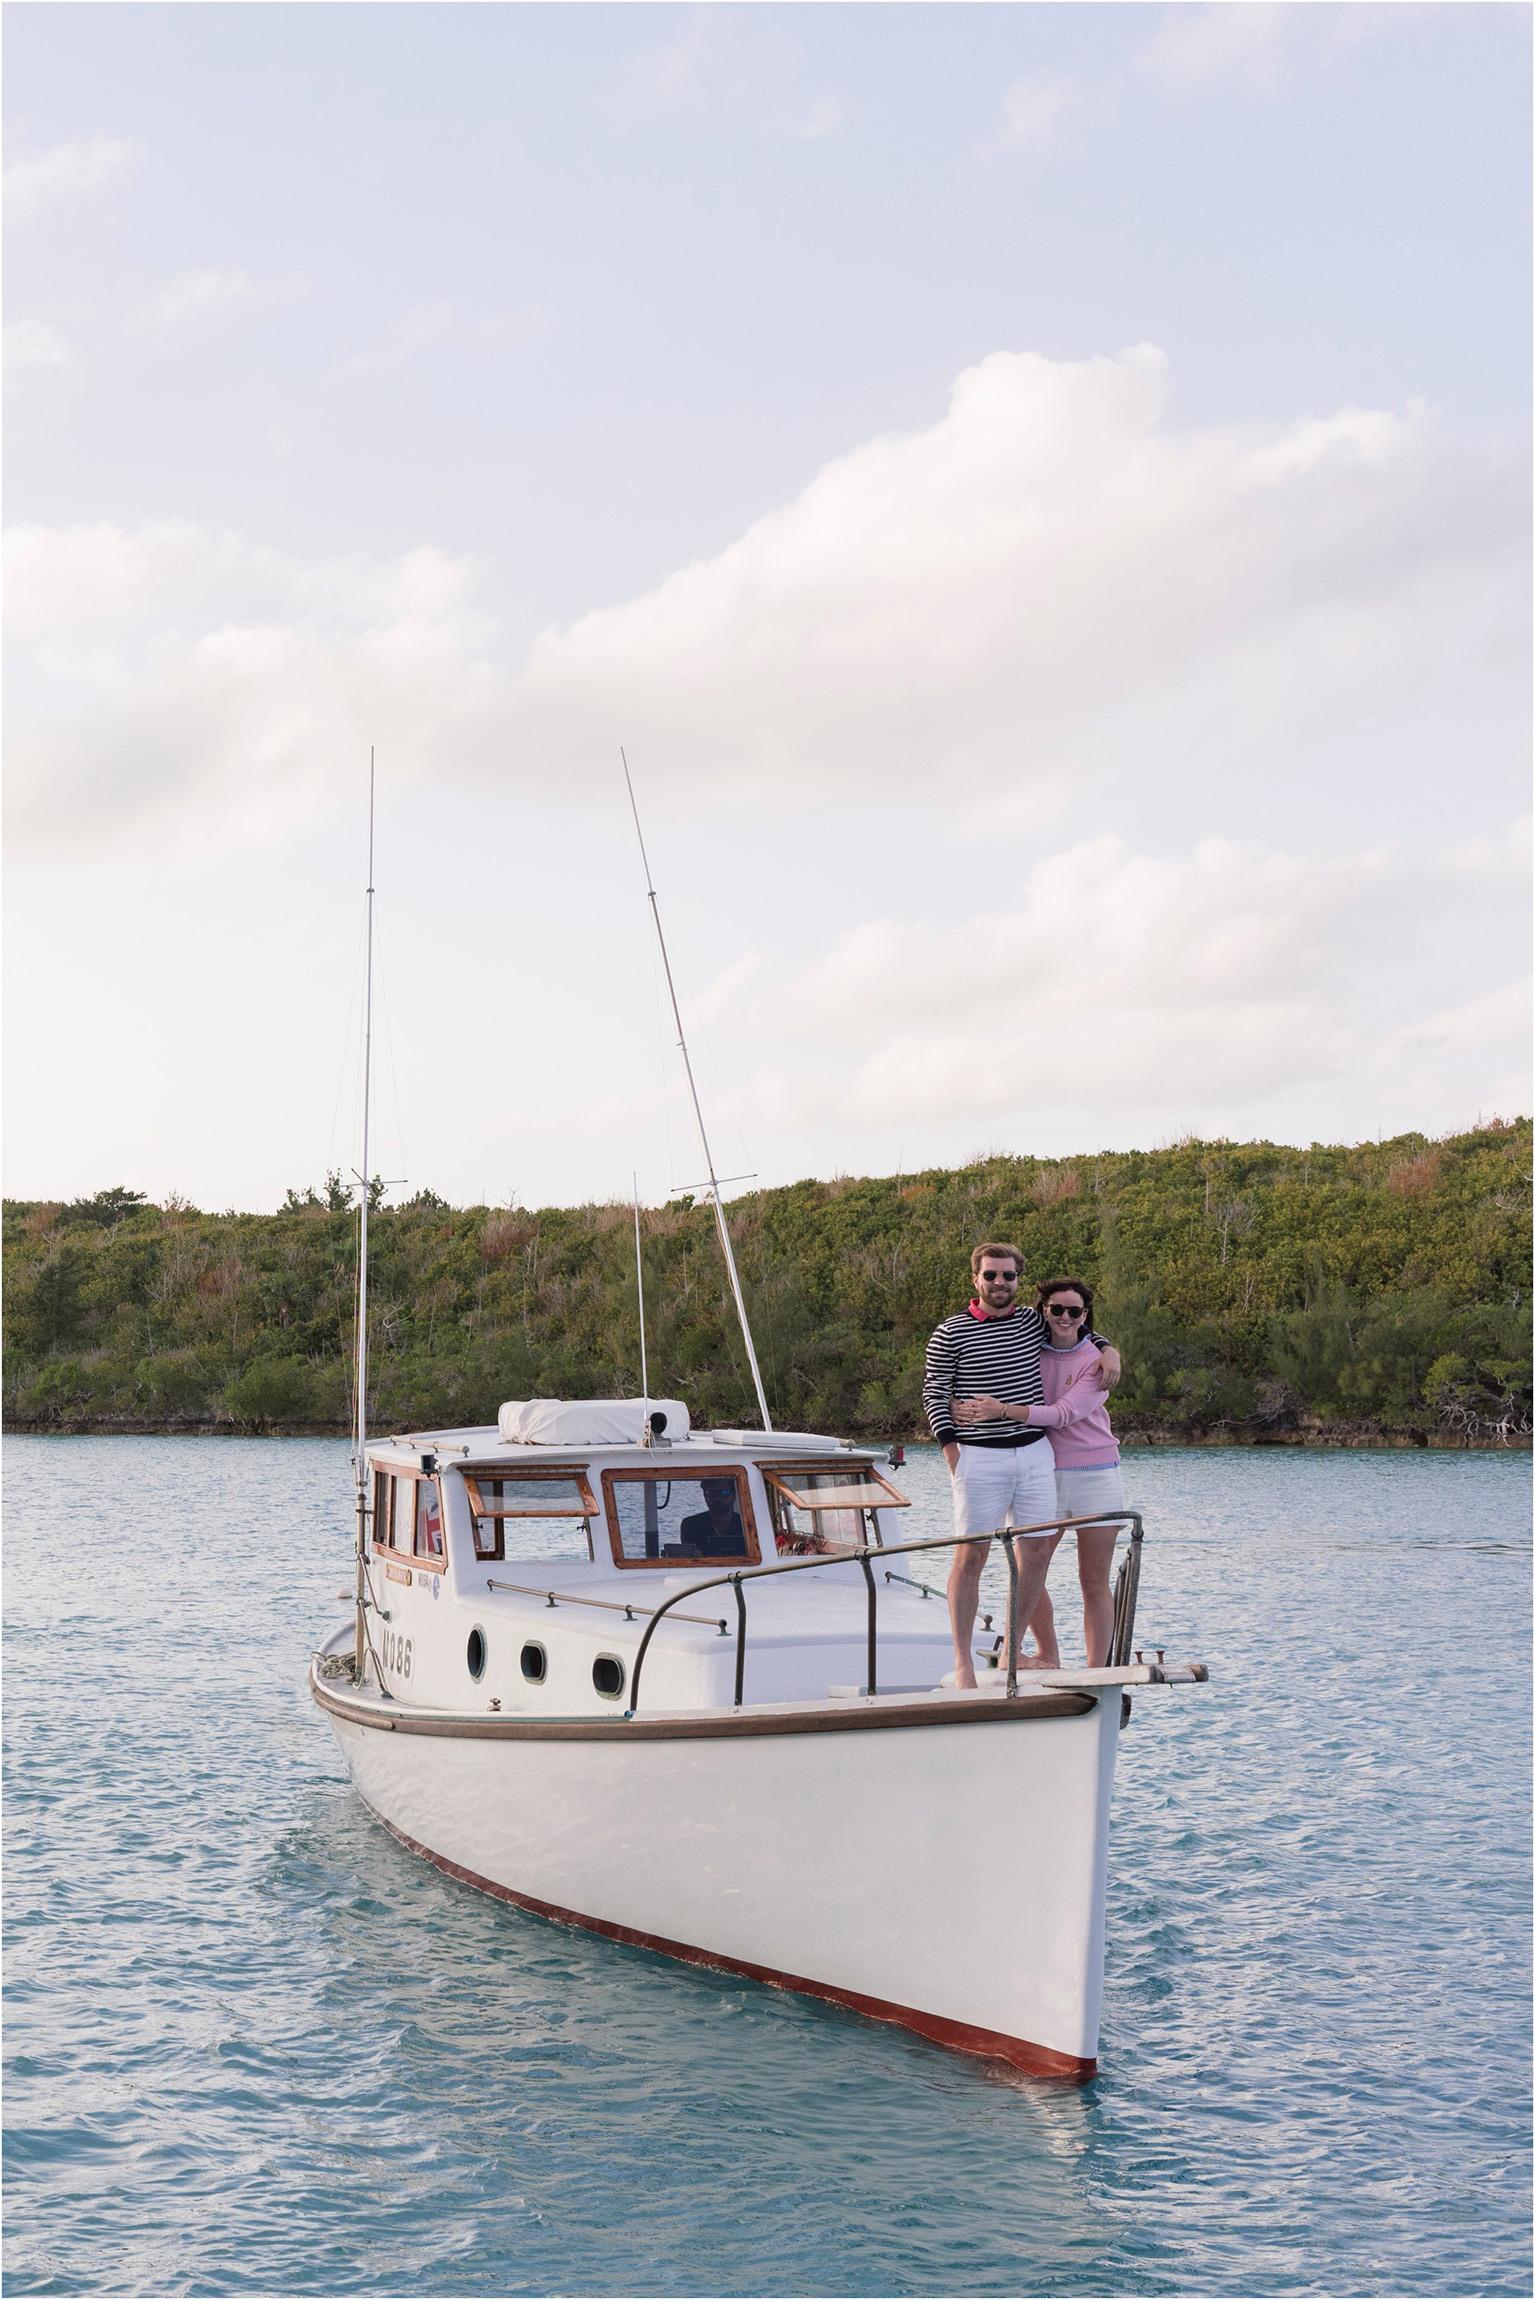 ©FianderFoto_Bermuda Content Photographer_Jackie Greaney_007.jpg